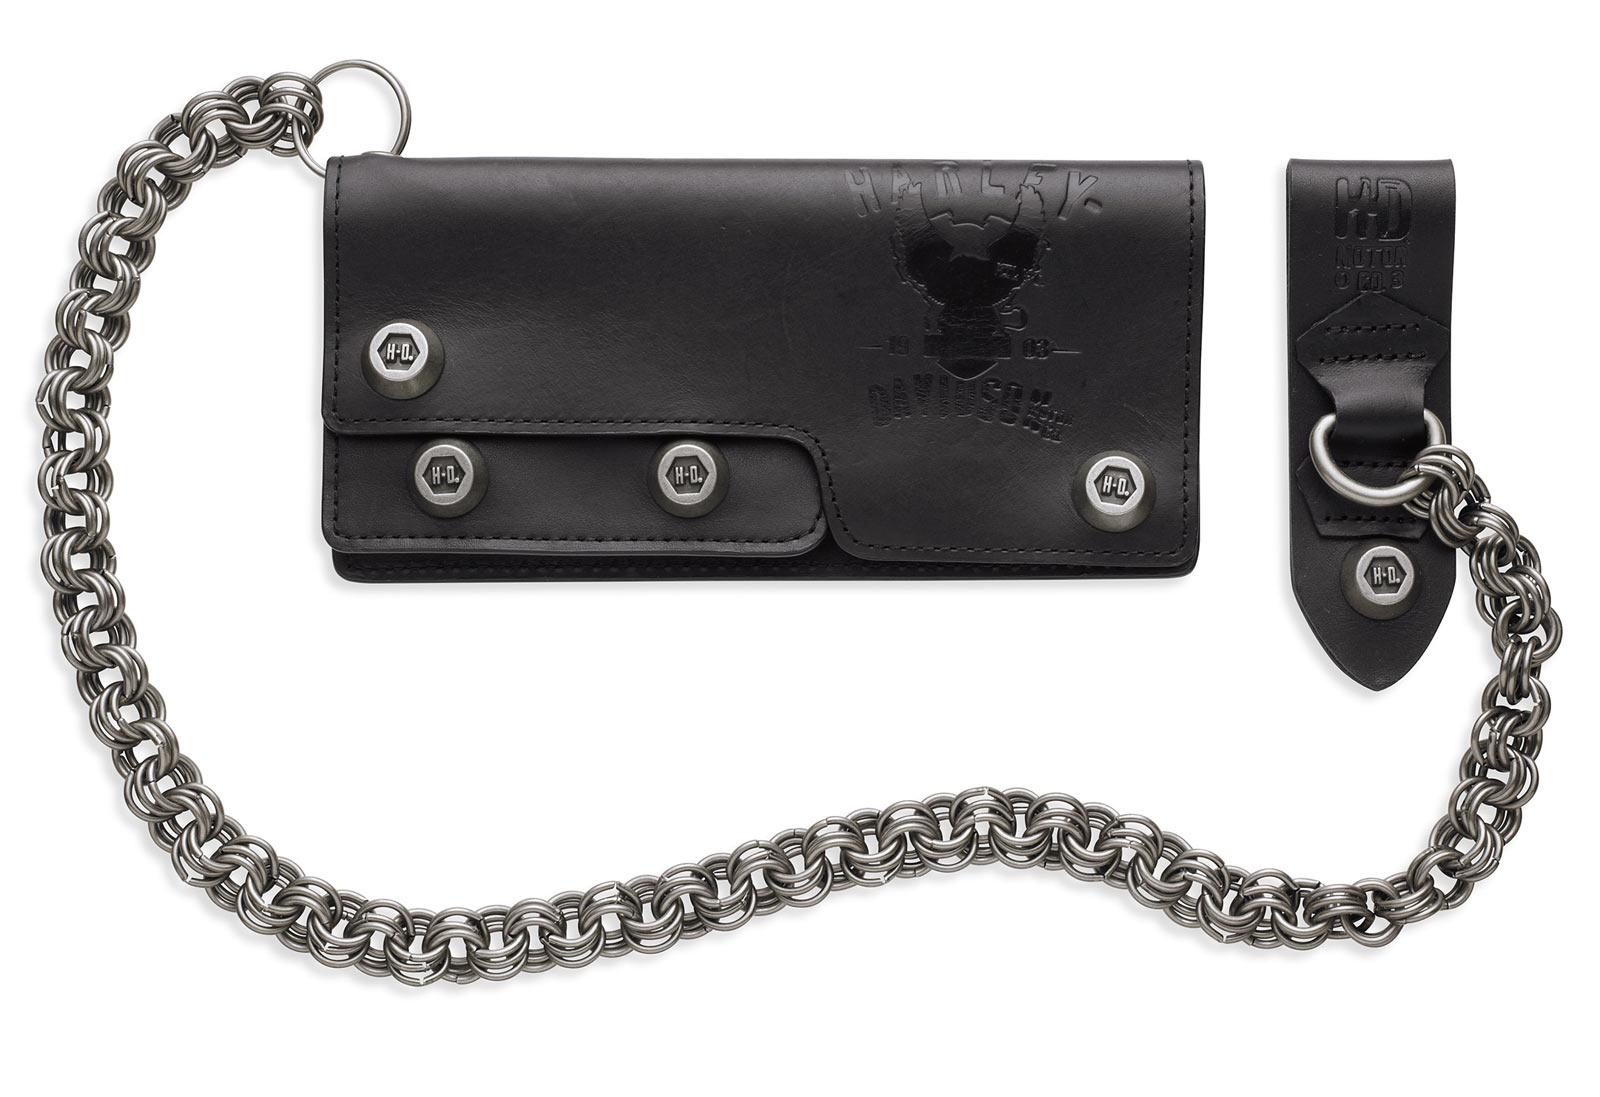 97633 17vm harley davidson chain biker wallet black at Harley-Davidson Eagle Carved harley davidson chain saver 99875-50